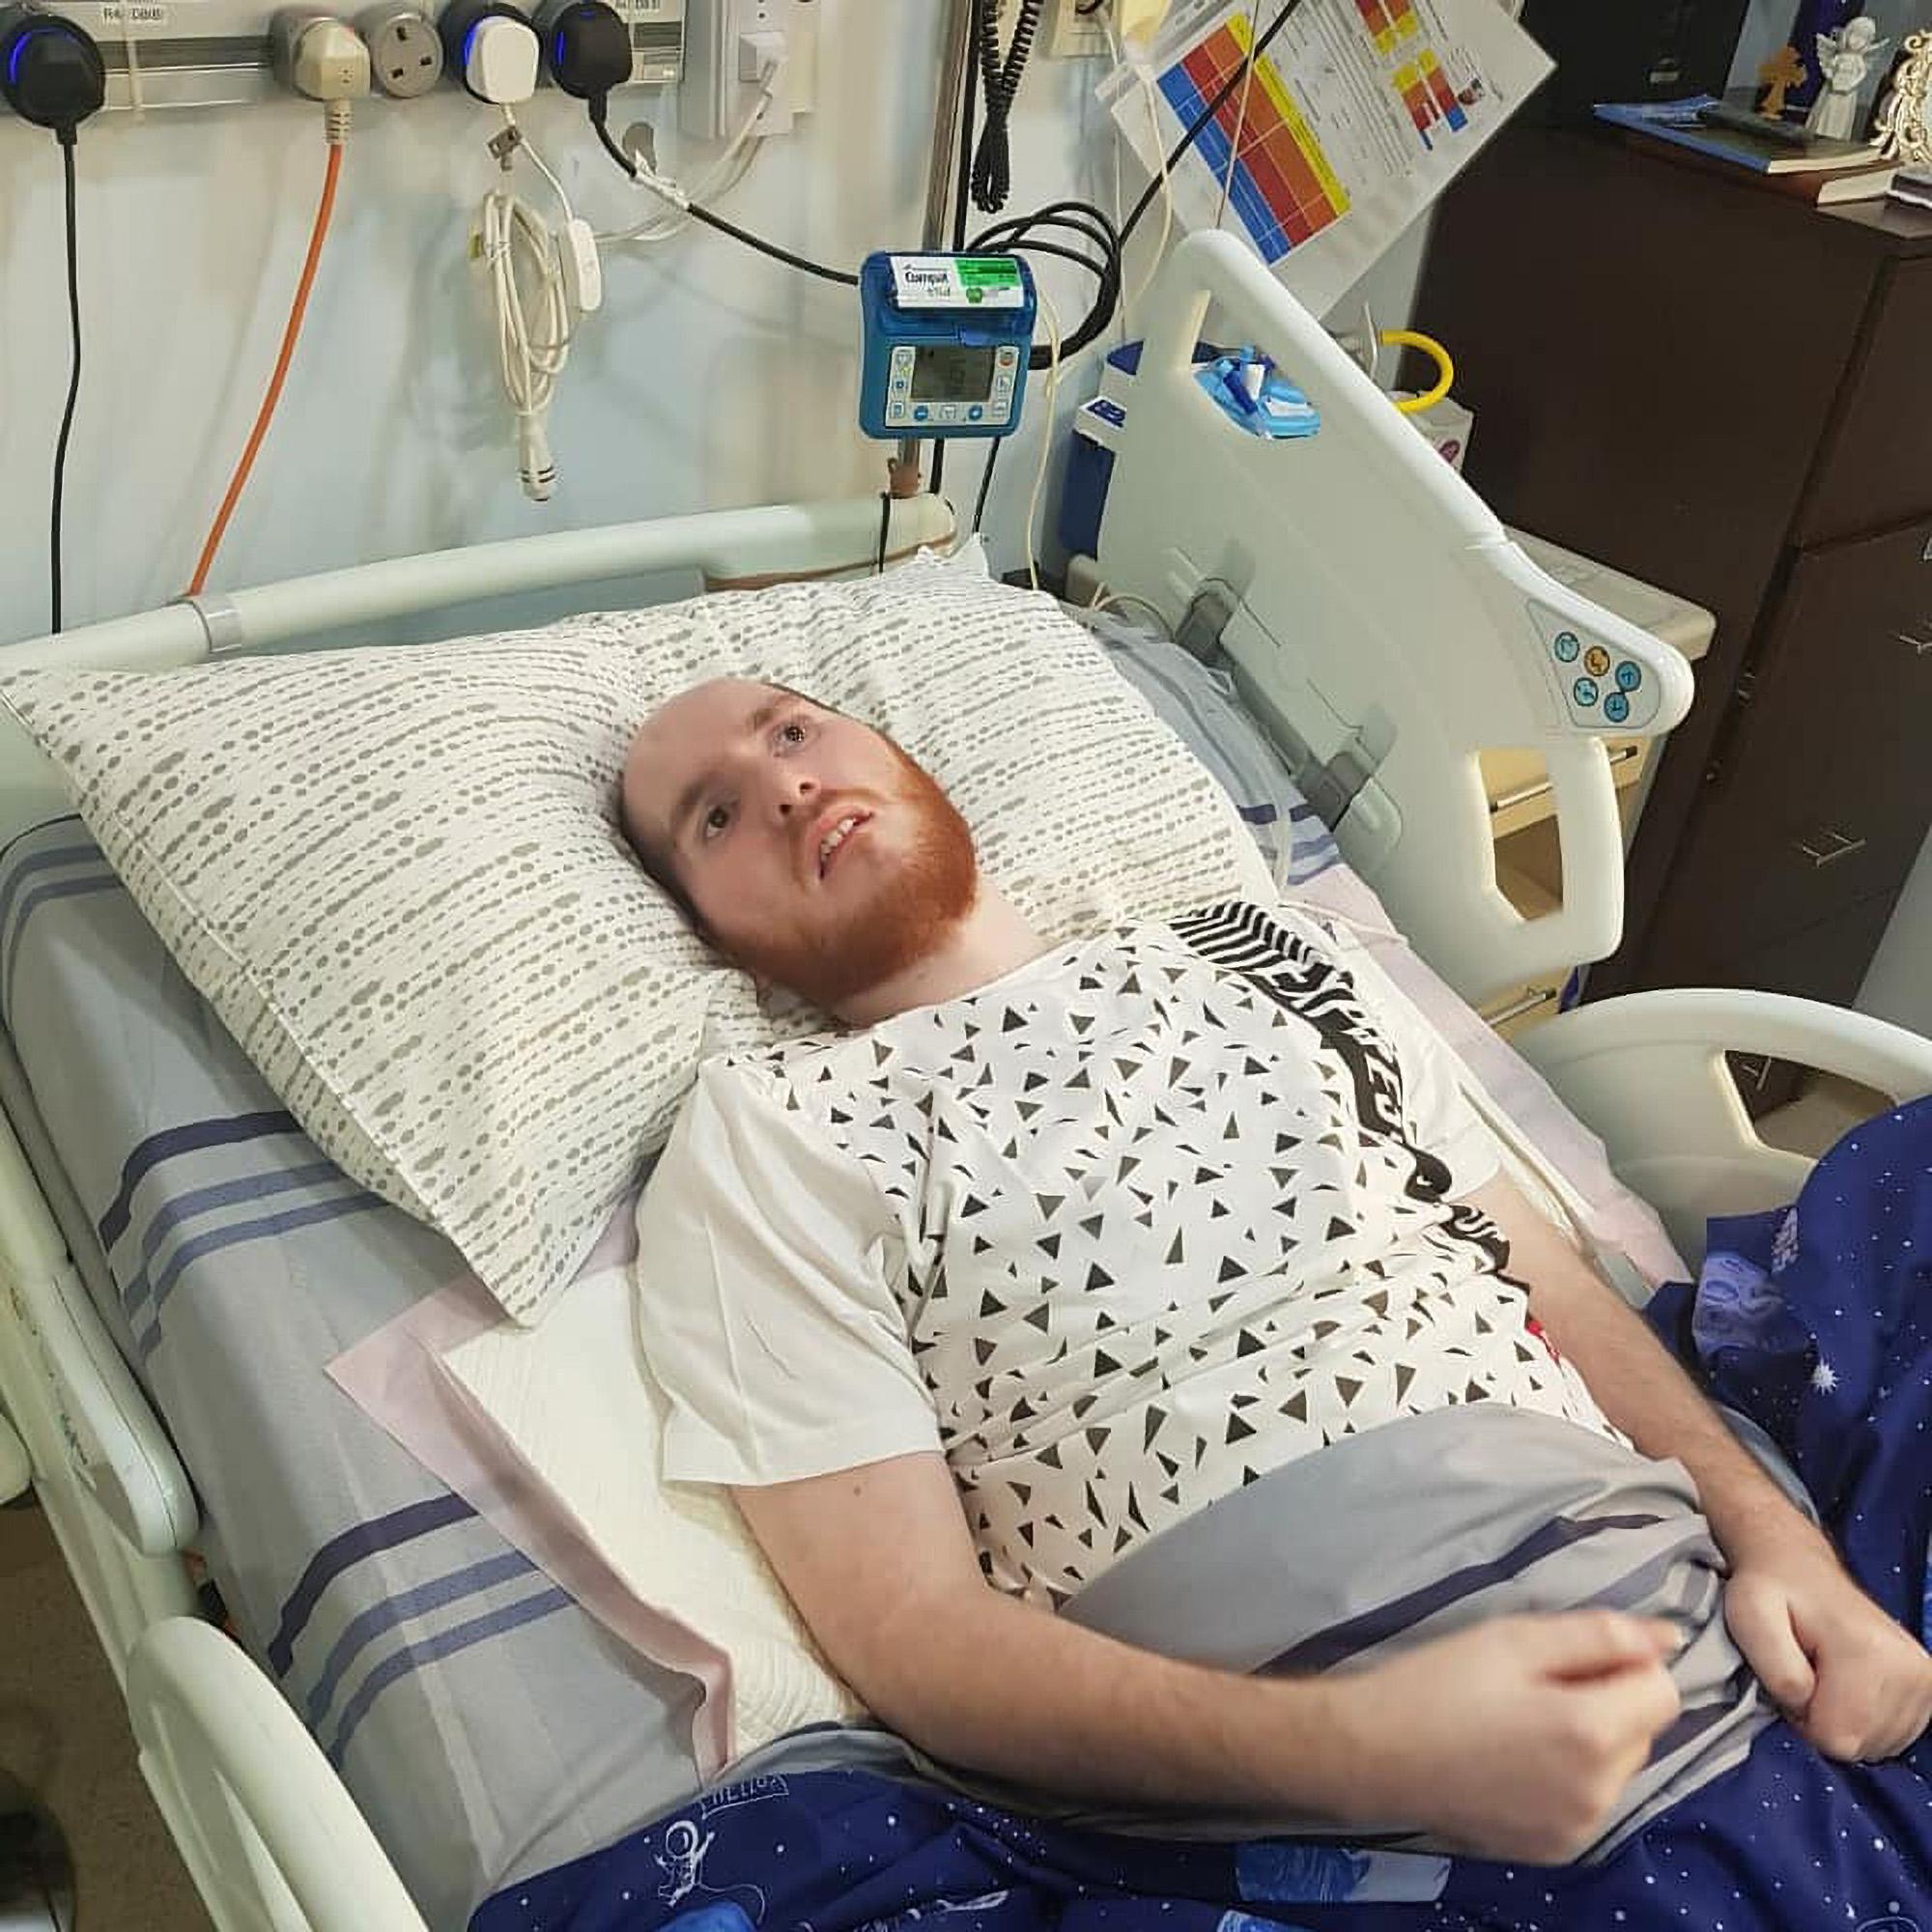 Bodybuilder's Mounting Hospital Bills Leave Family Facing Homelessness